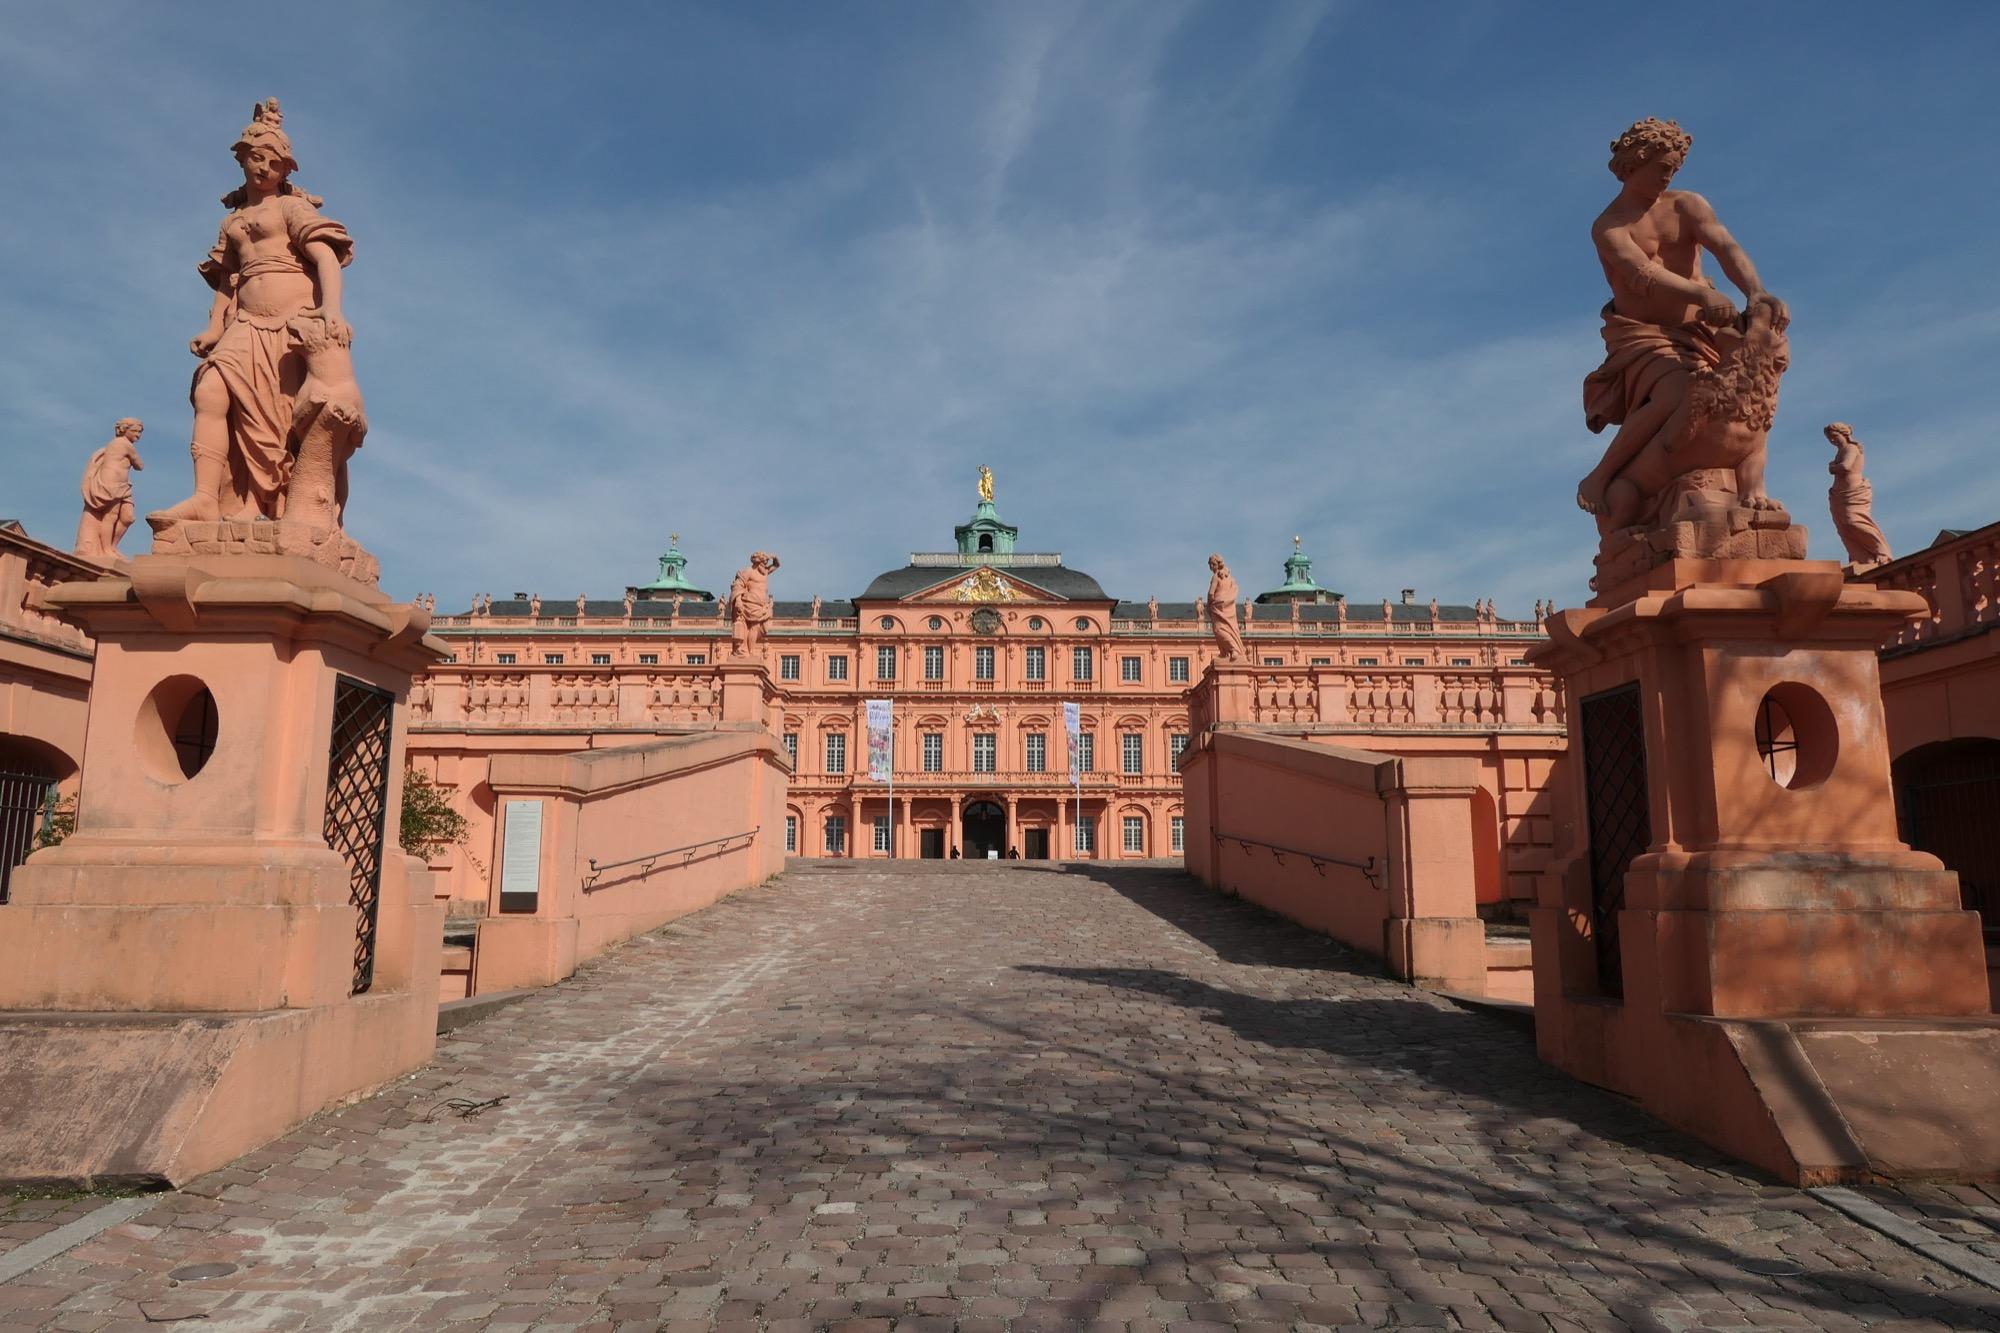 Entrance to Rastatt Residential Palace.